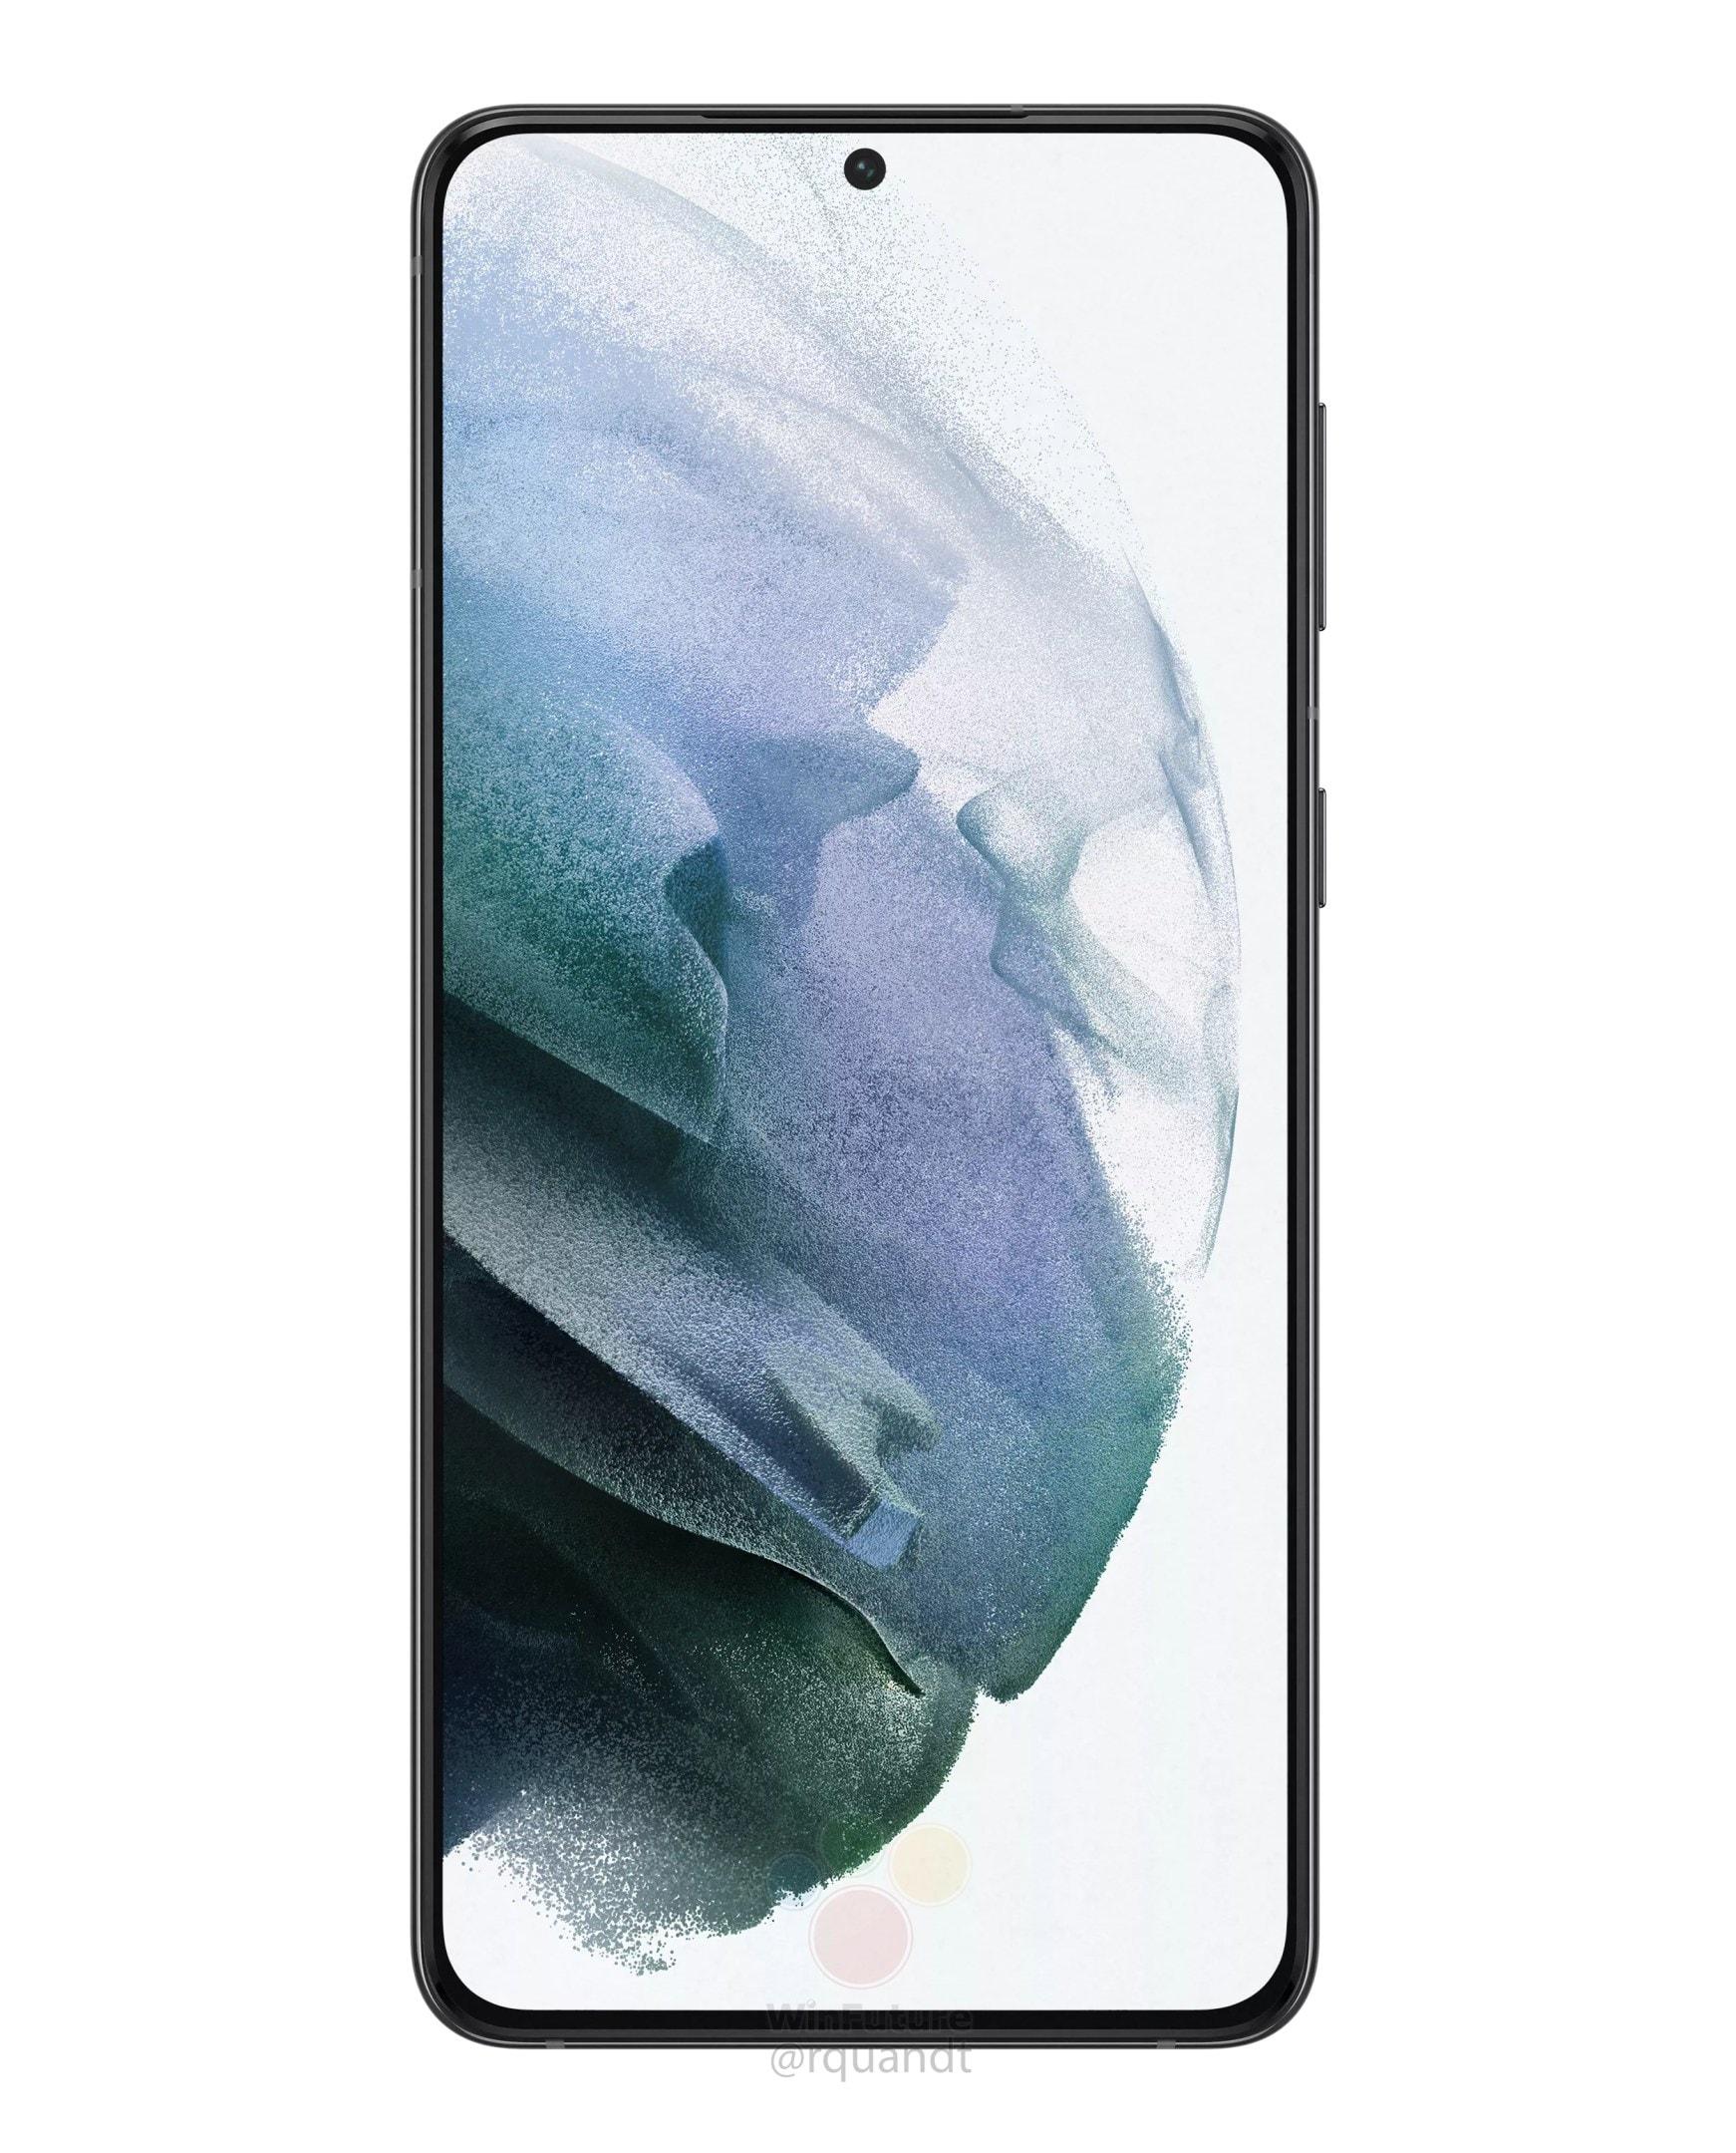 Samsung-Galaxy-S21-Plus-1608930629-0-0